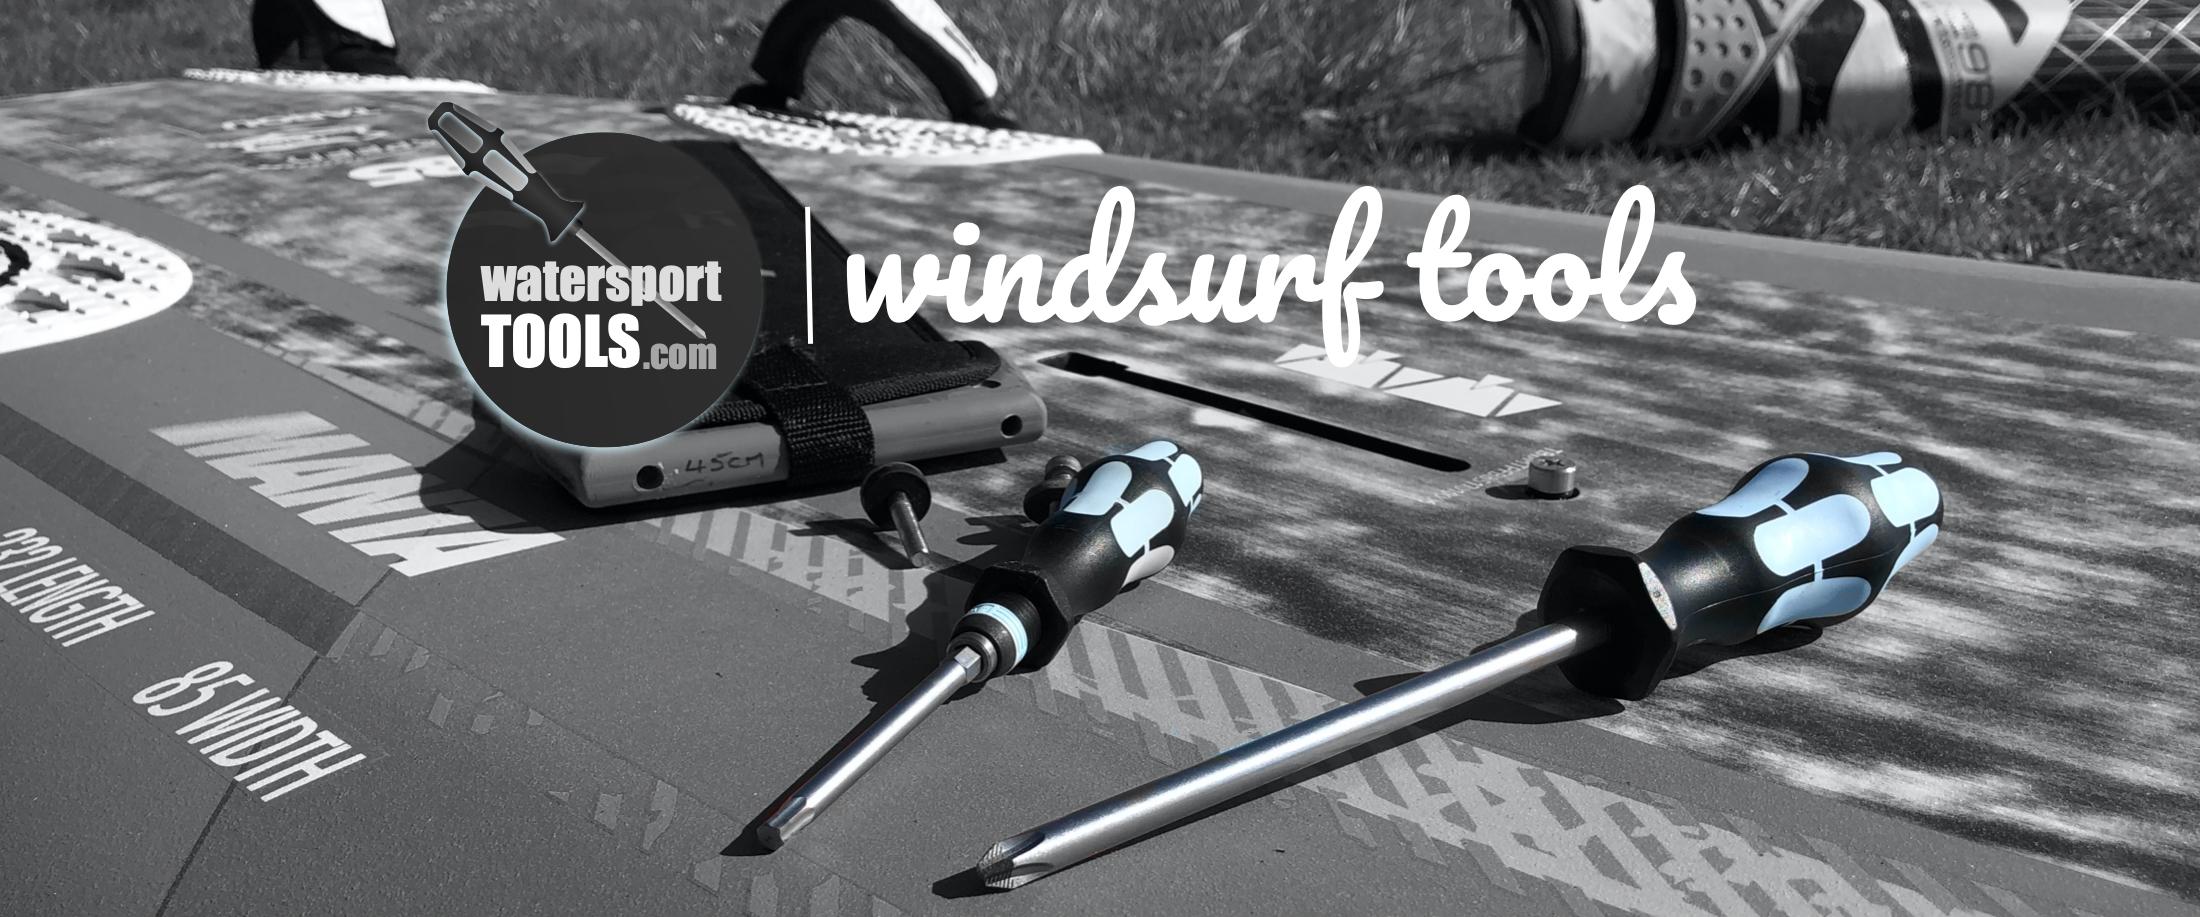 Windsurf tools gereedschap